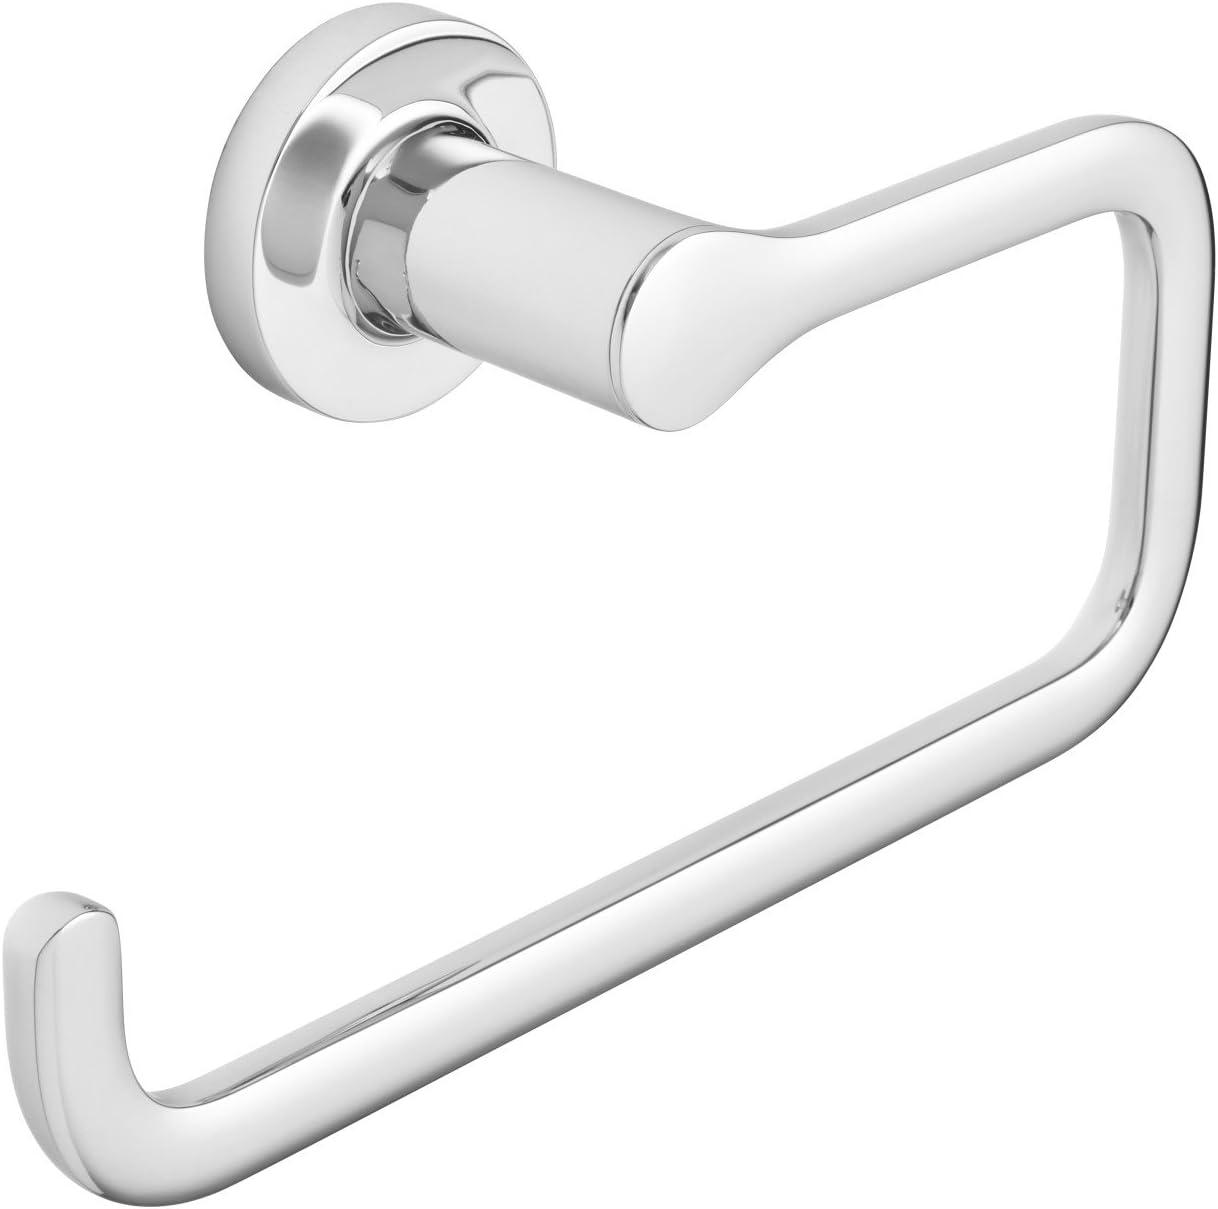 American Standard 7105190.002 Studio S Towel Ring, Polished Chrome